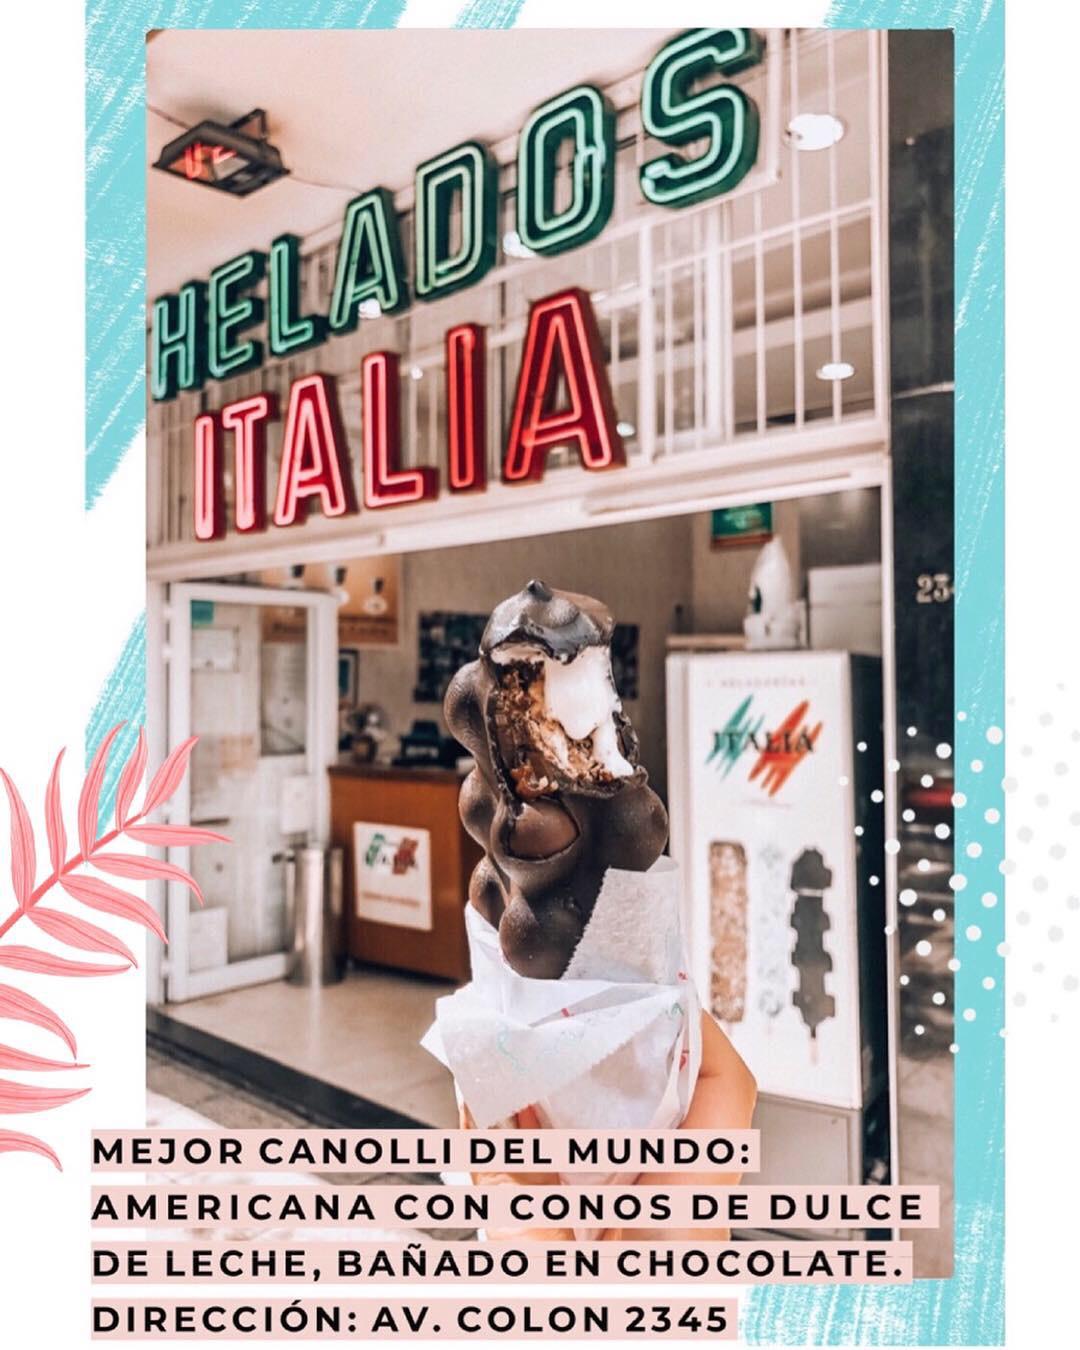 cannolis heladeria Italia